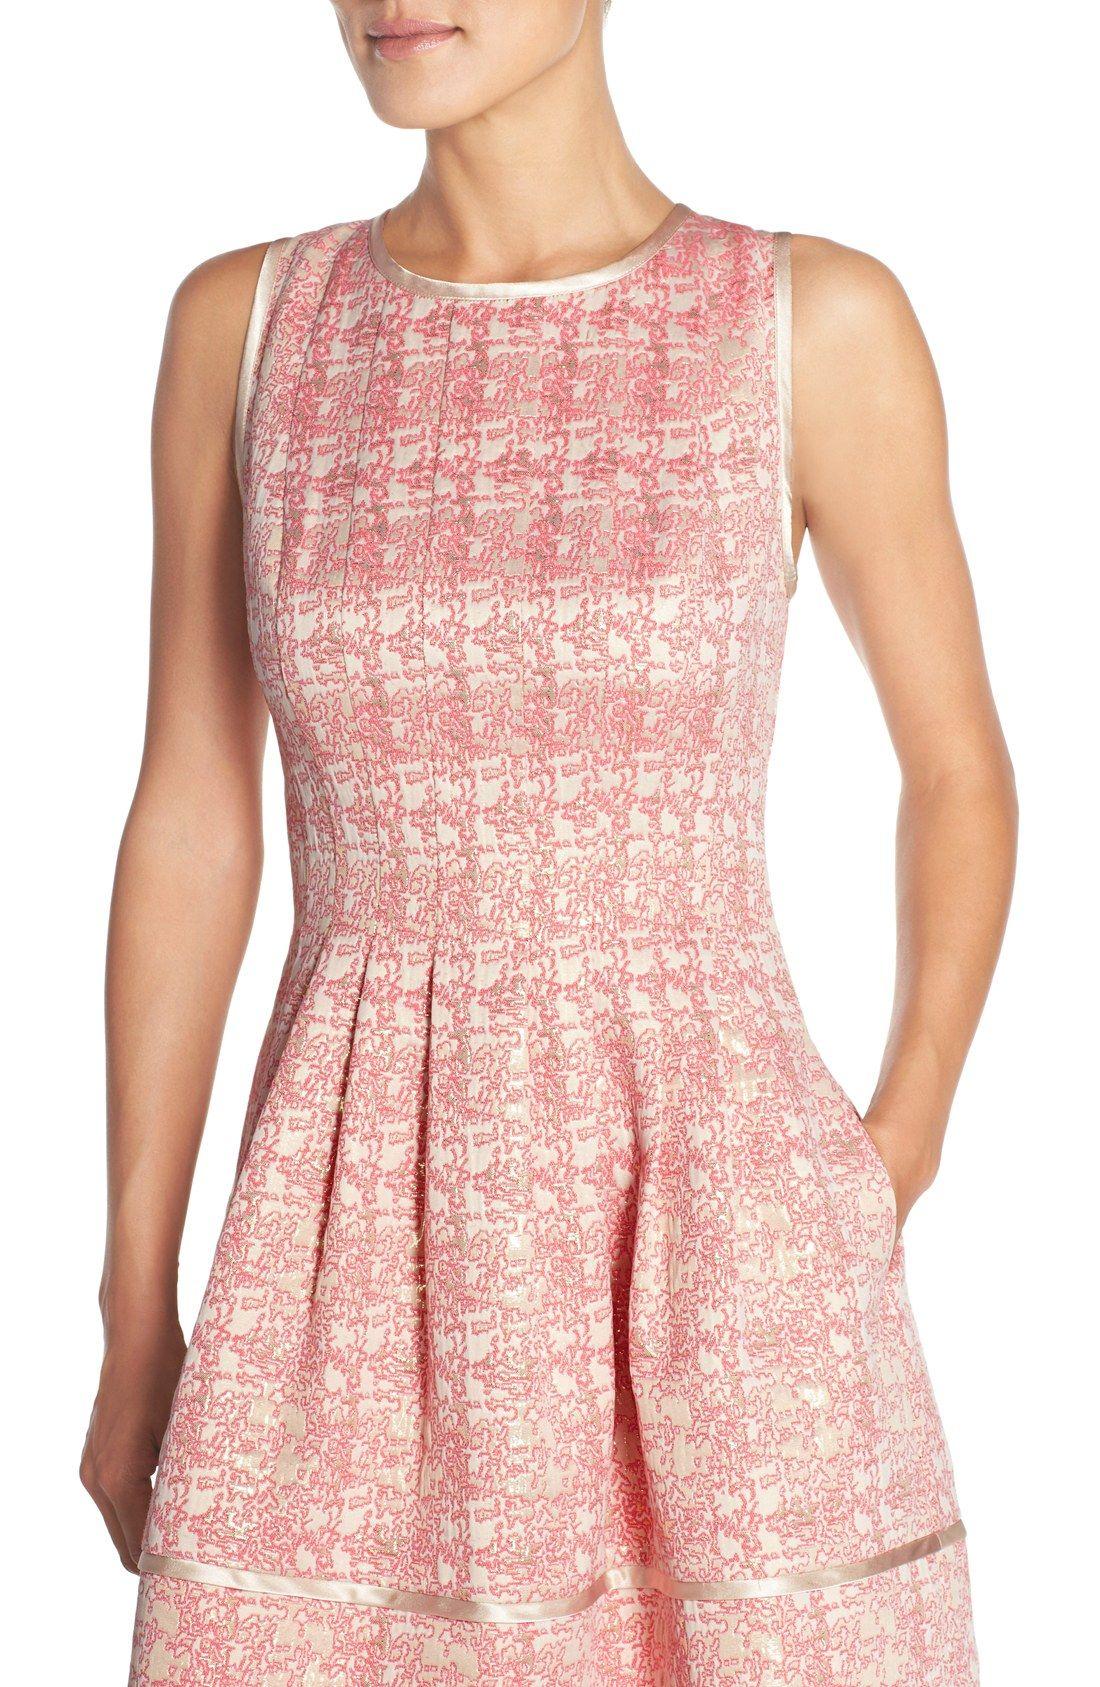 Vince Camuto Metallic Jacquard Fit Flare Dress Nordstrom Fit Flare Dress Dresses Clothes [ 1687 x 1100 Pixel ]